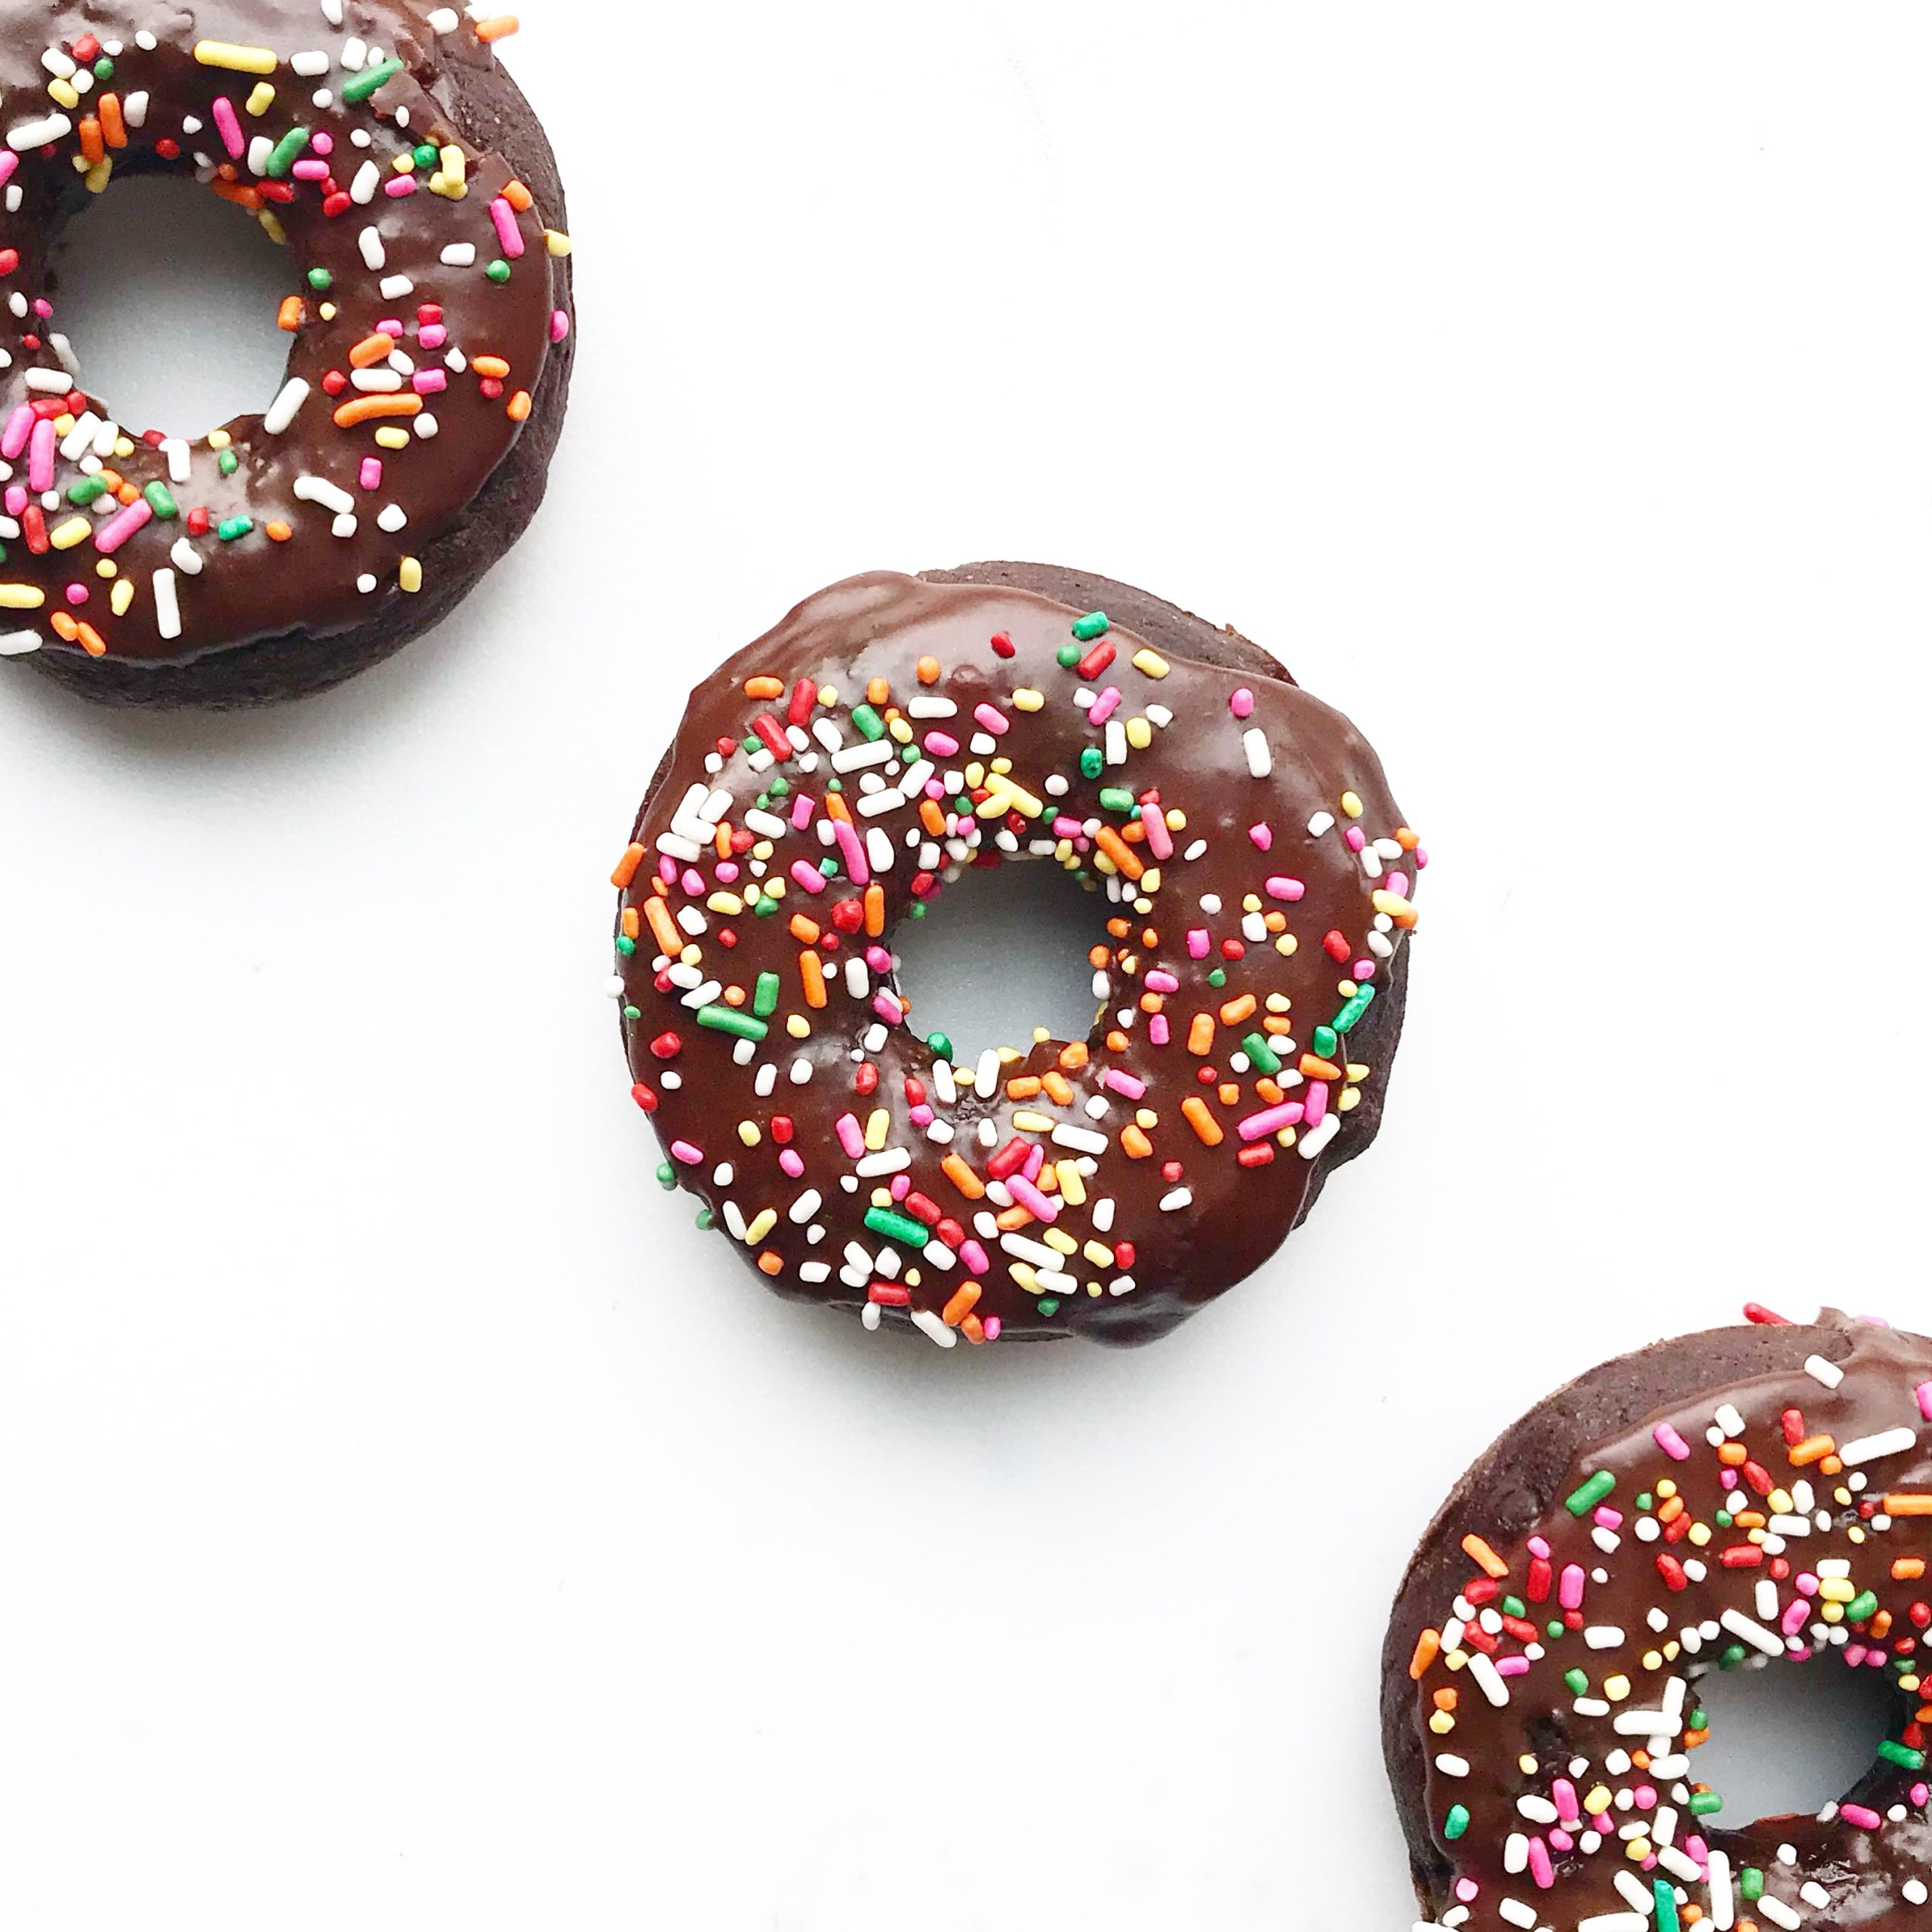 rainbow sprinkle baked chocolate donuts